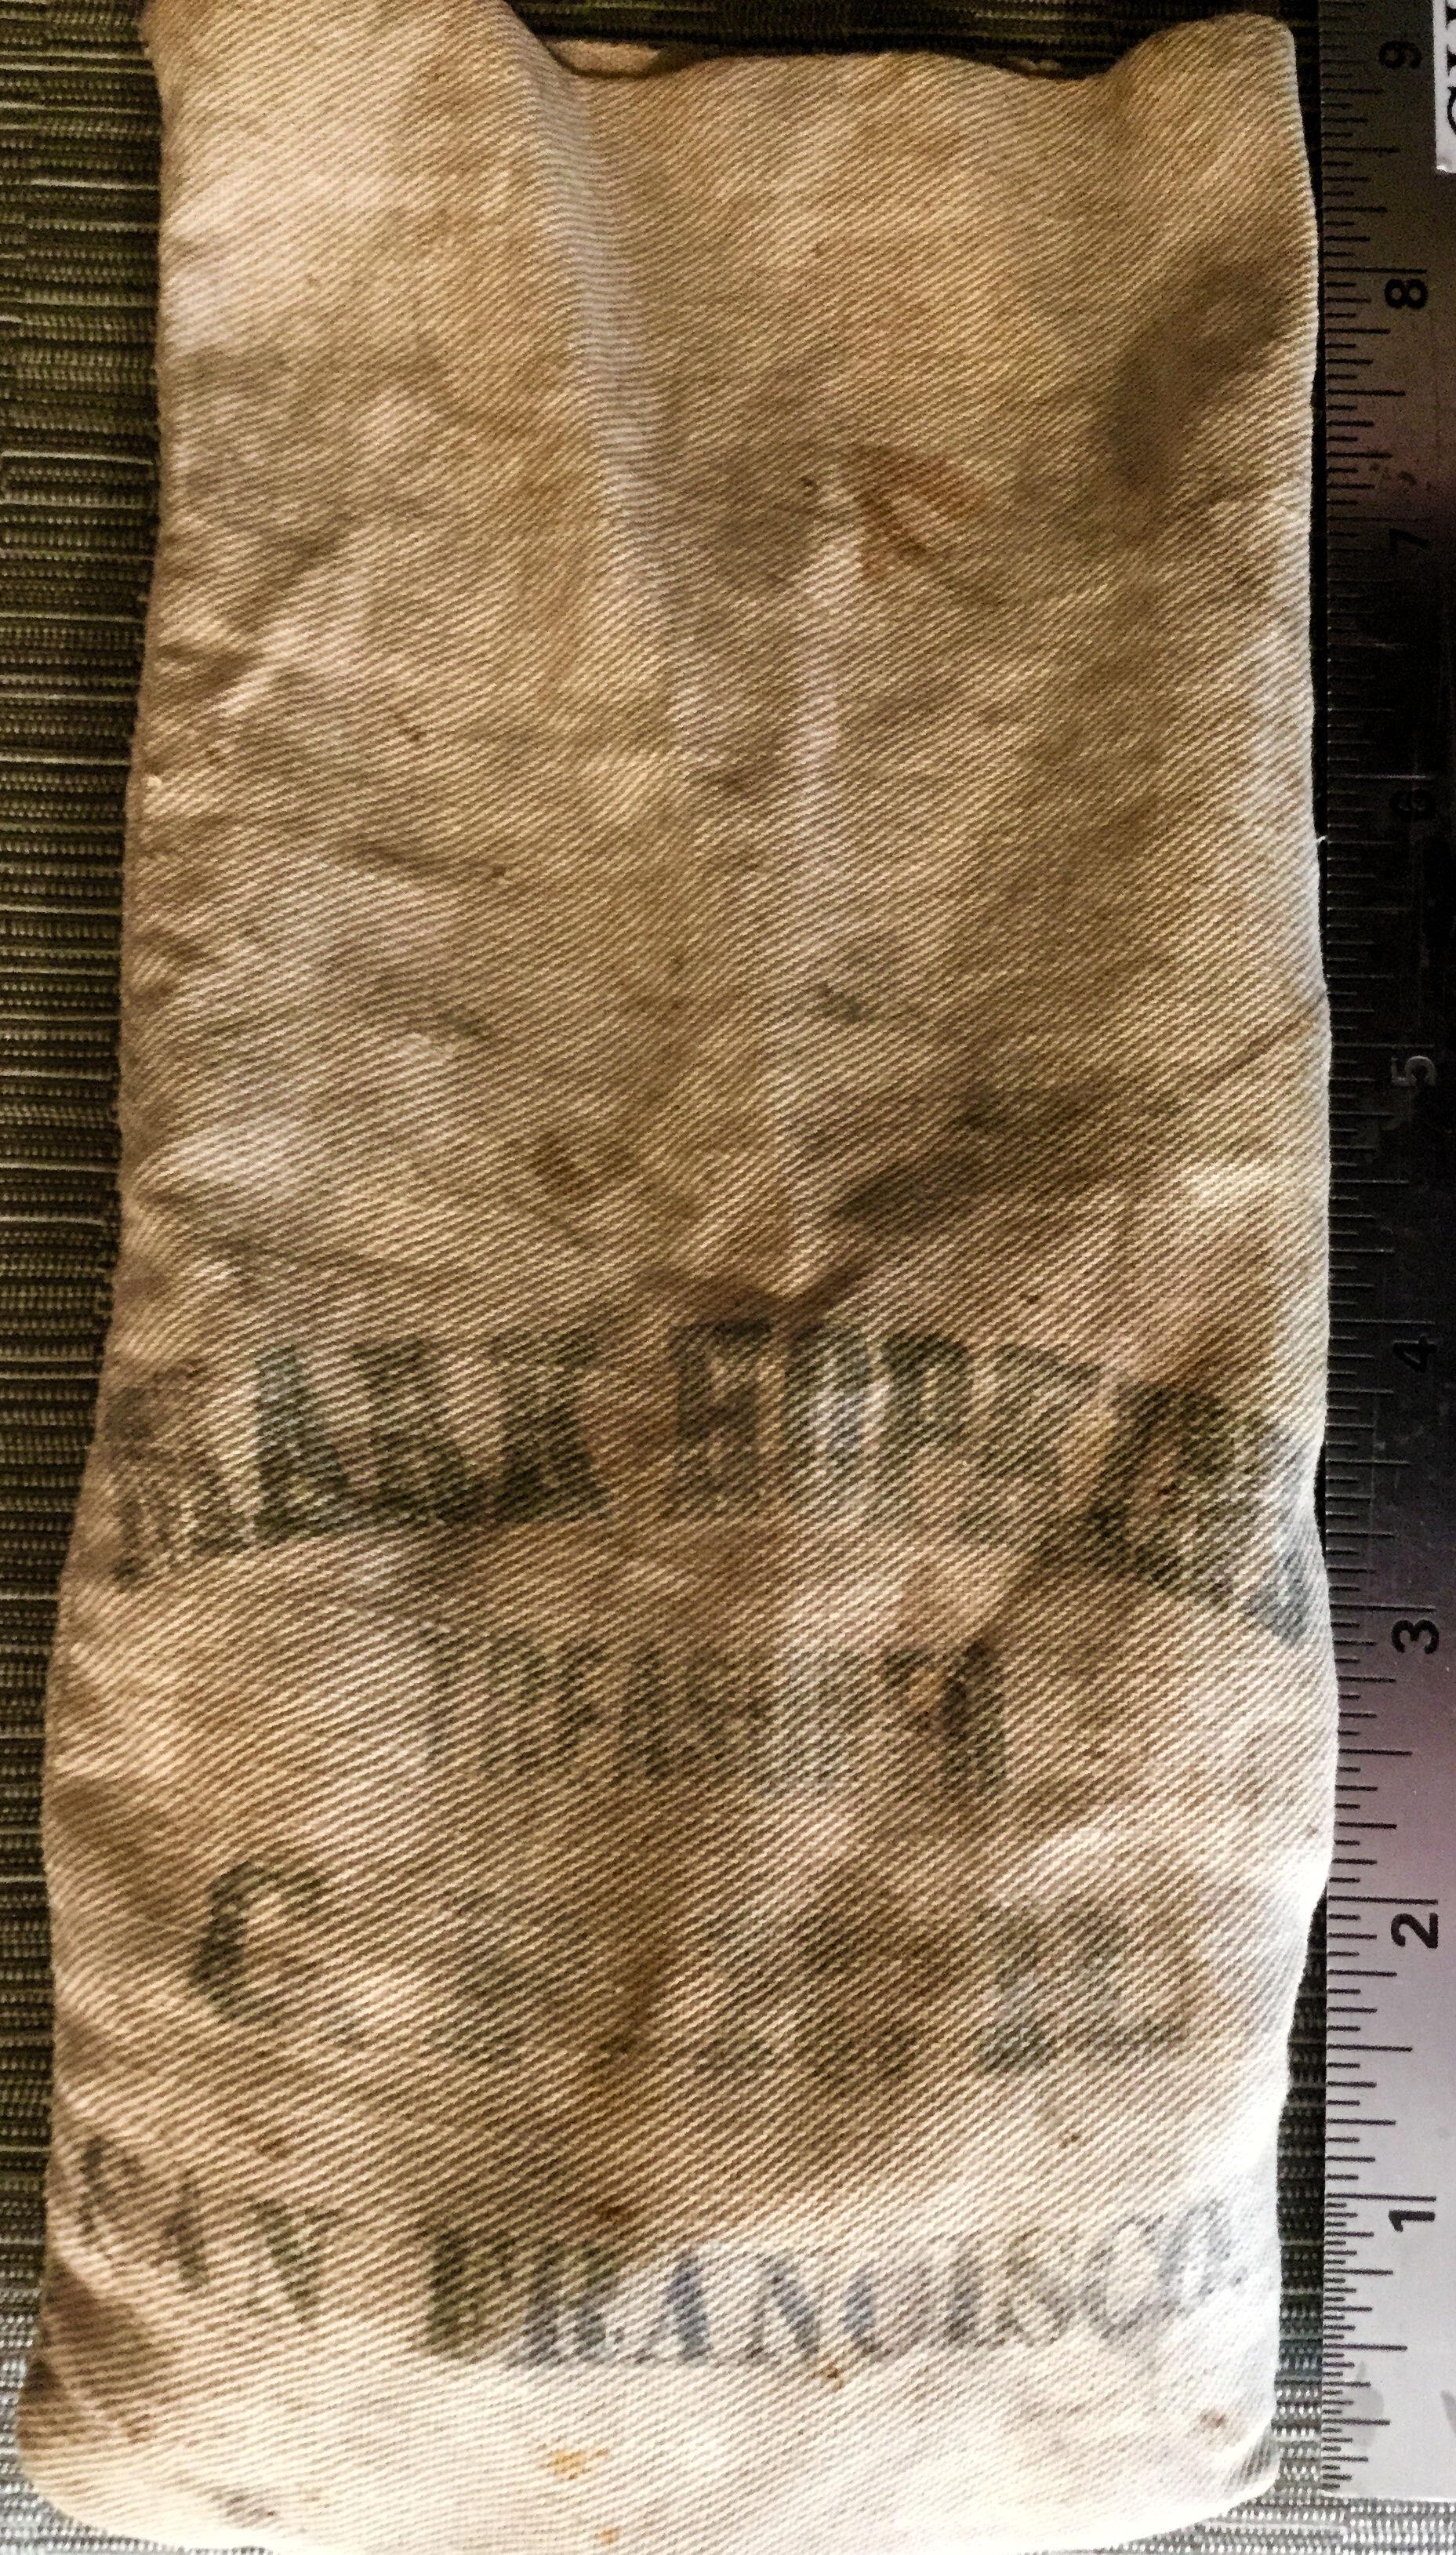 cloth money bag - Old linen bag from C.P.R.R. - 'Mark Hopkins, Treasurer, C.P.R.R., San Francisco.'